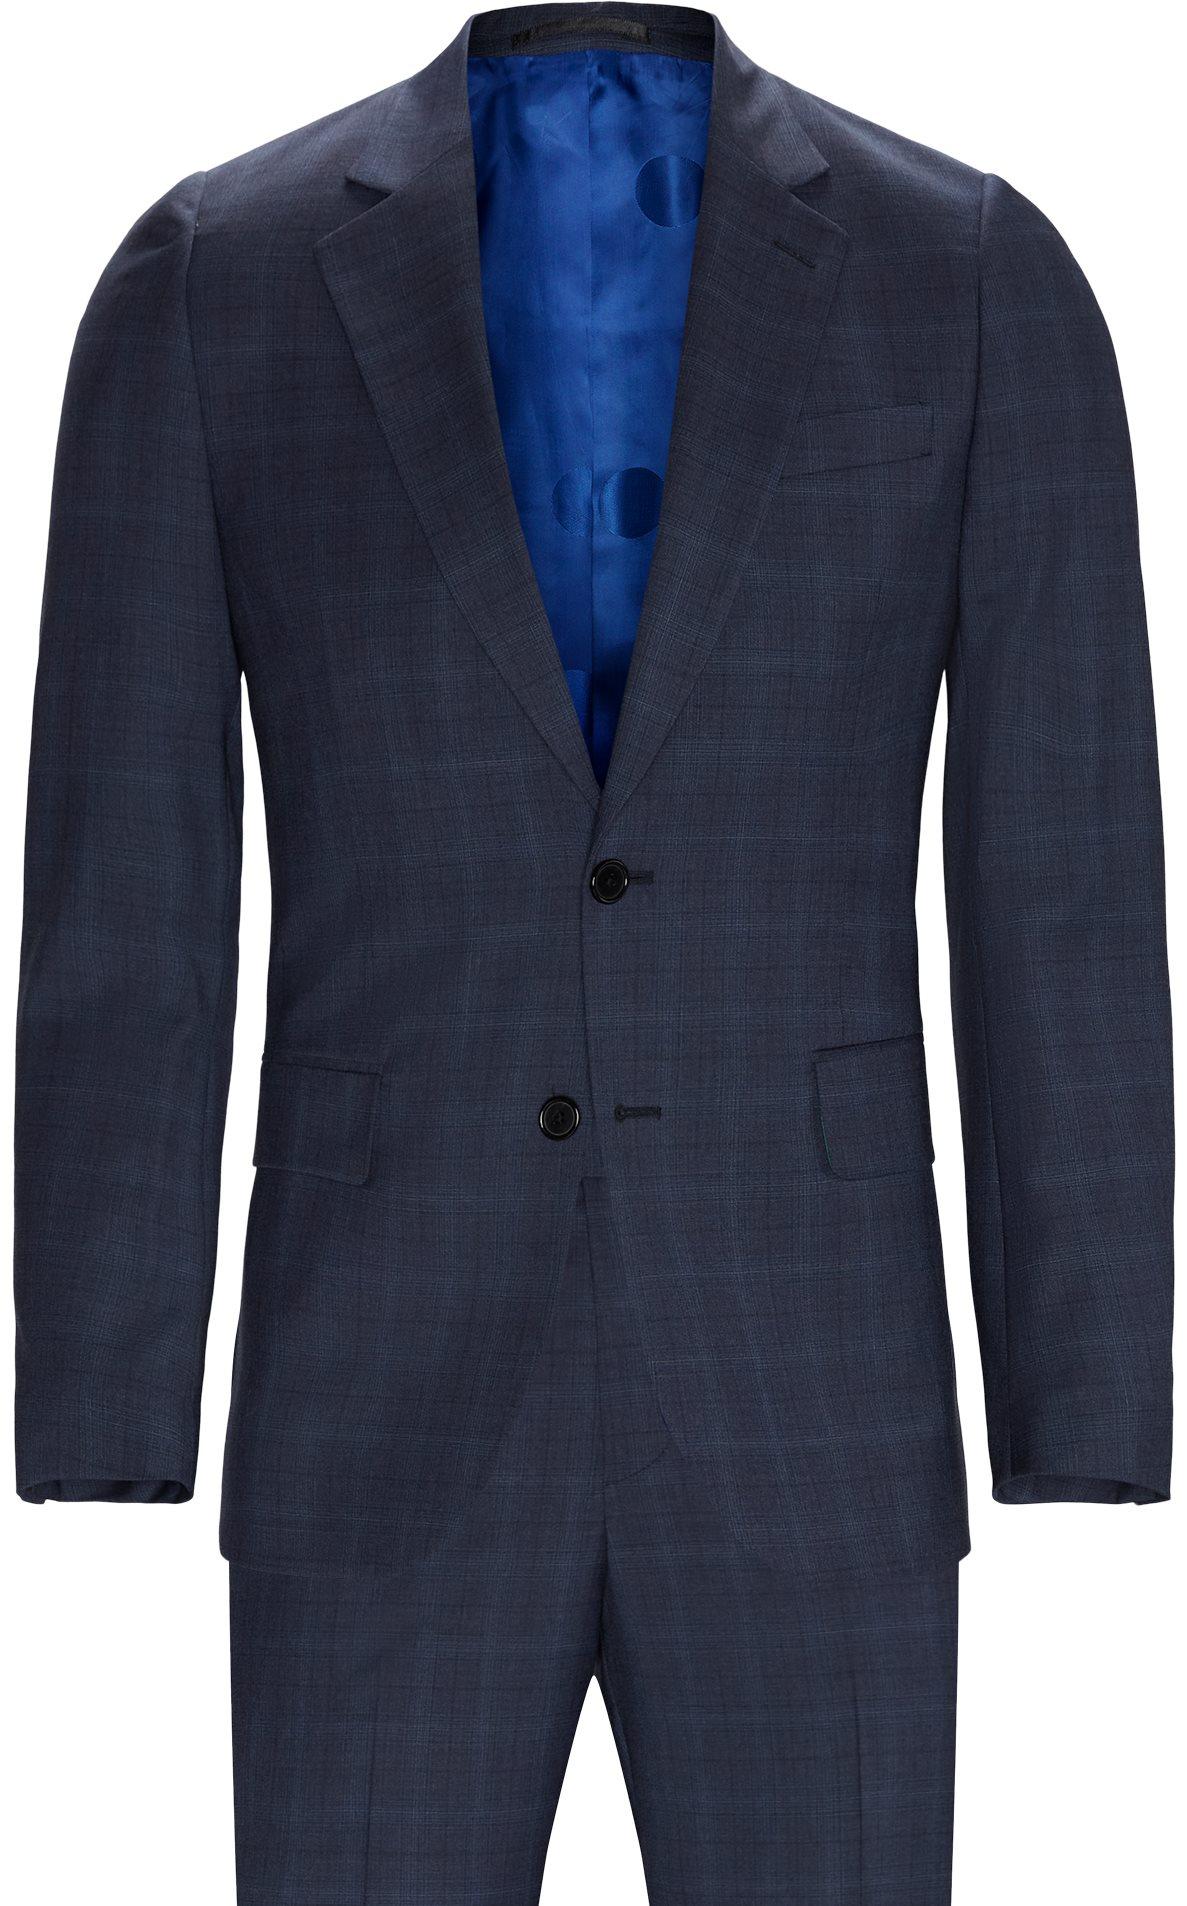 Suits - Slim fit - Grey